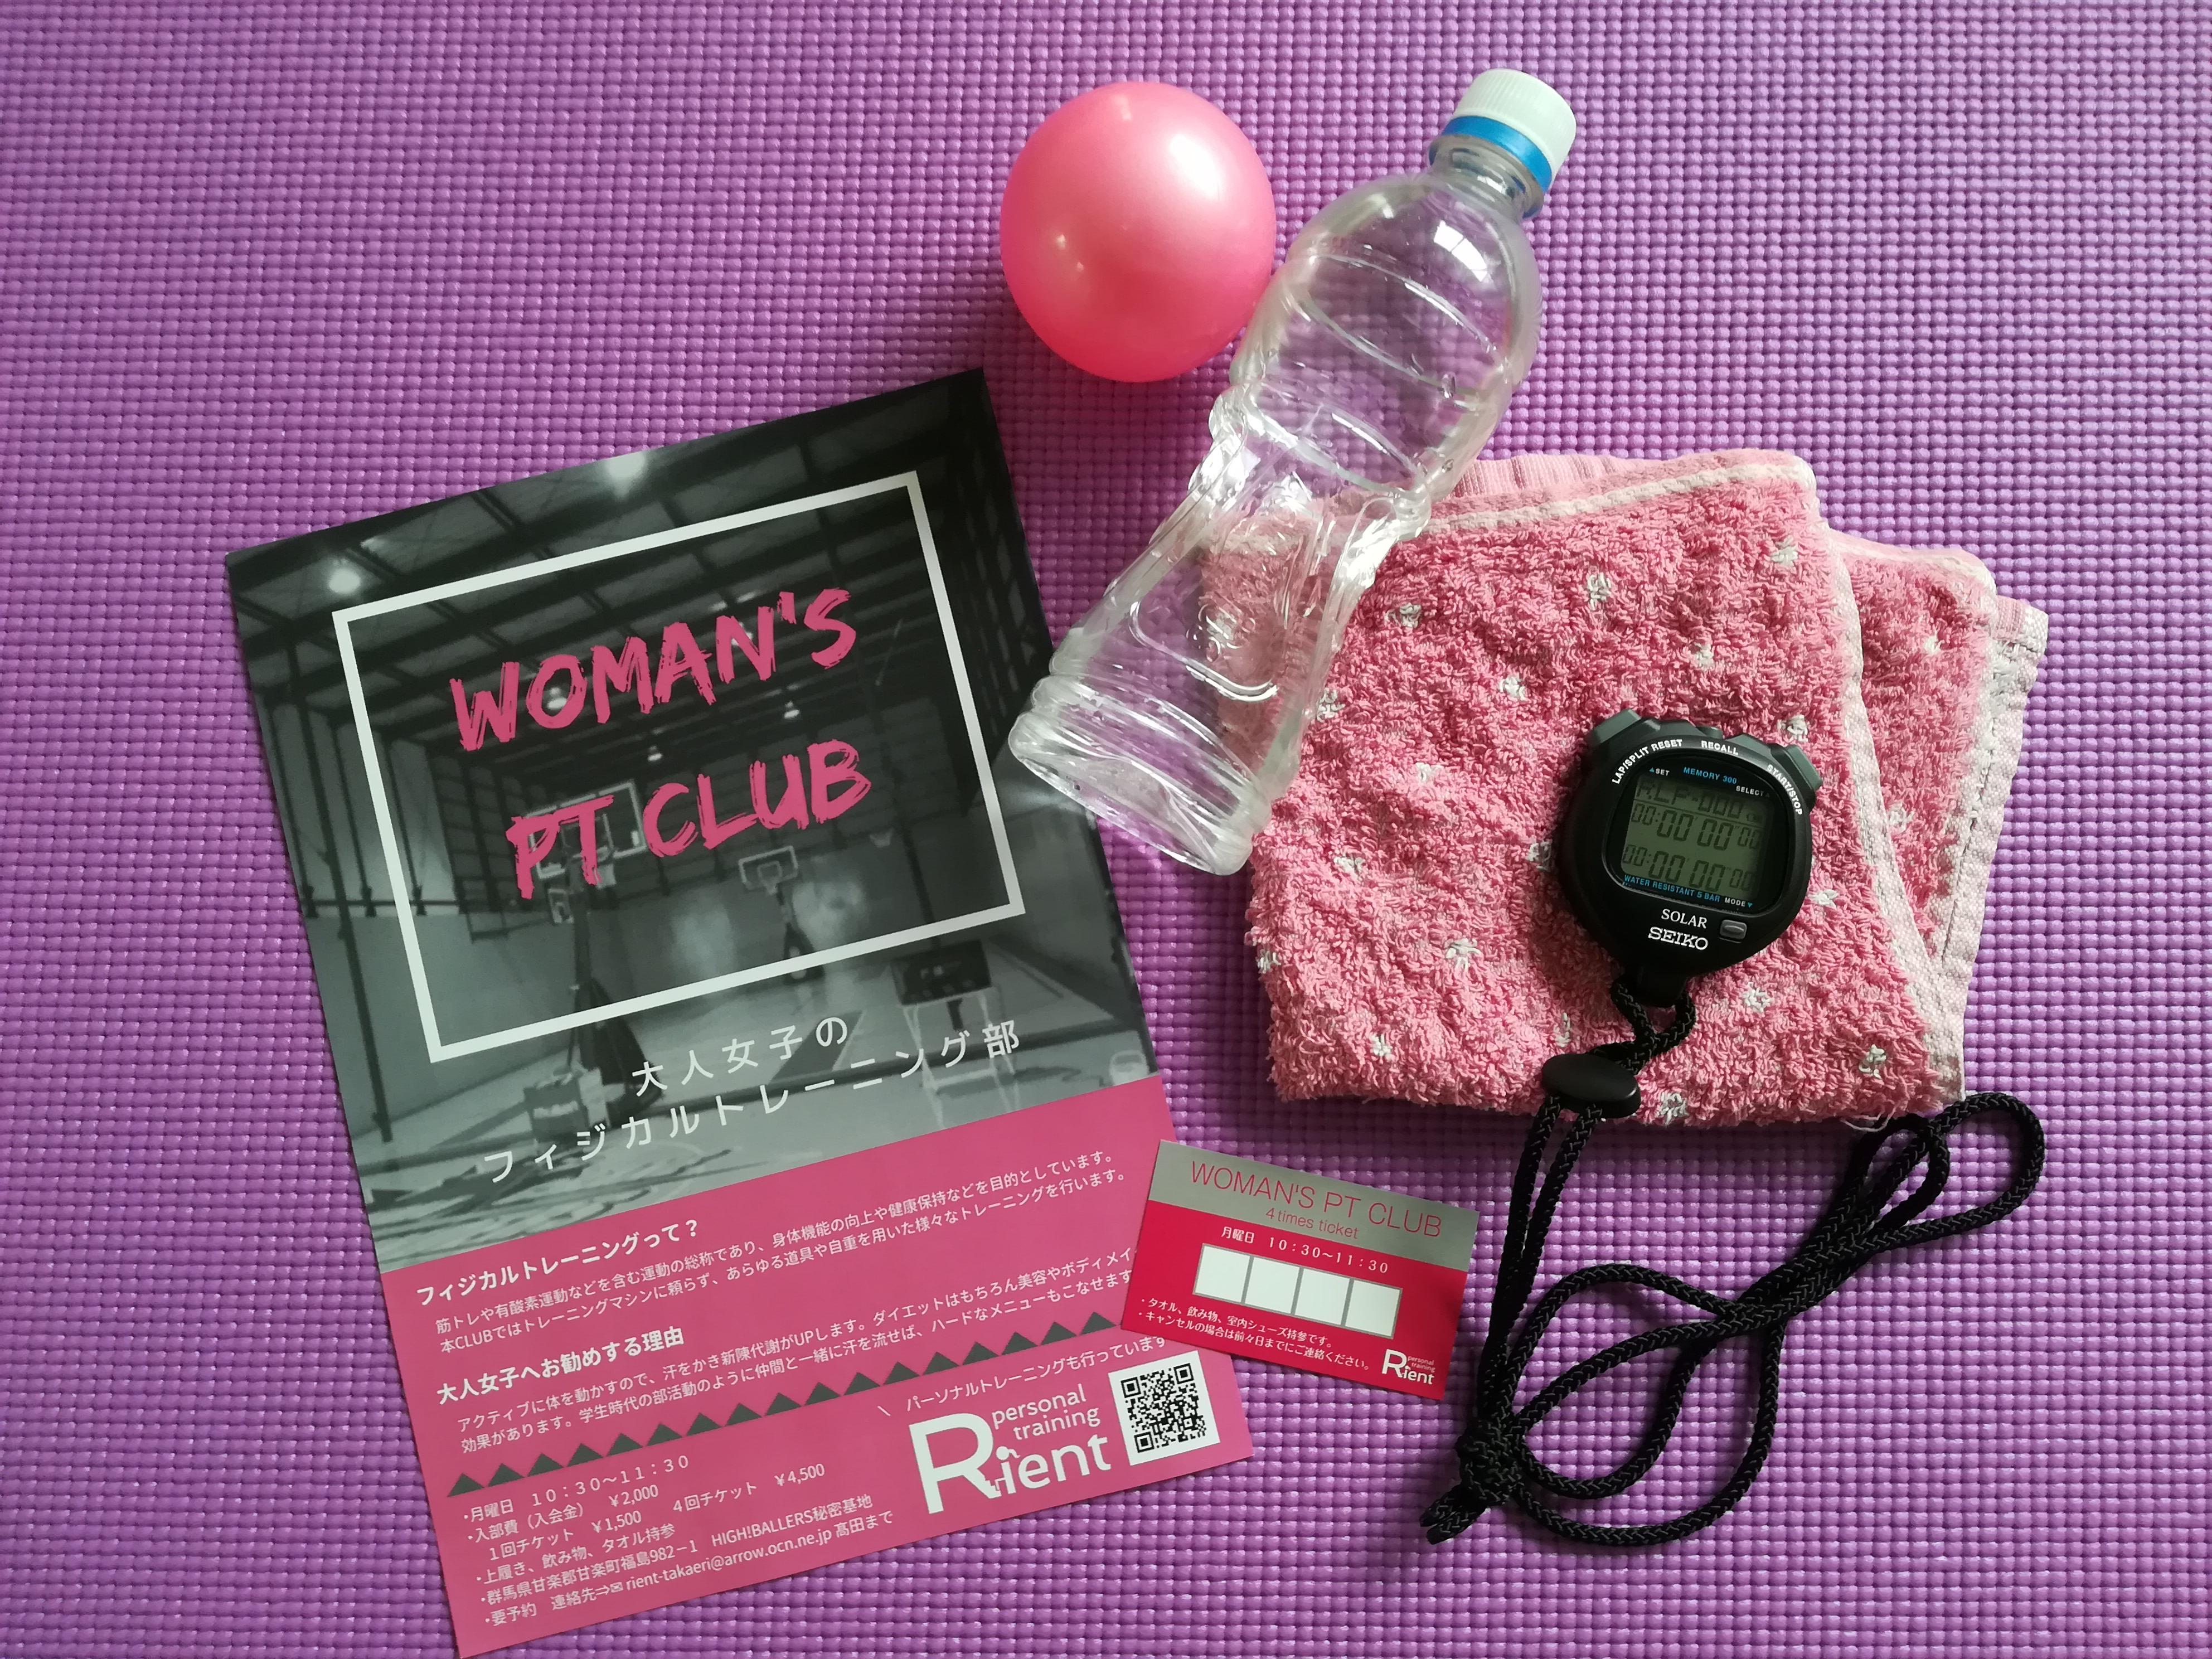 WOMAN'S PT CLUBのイメージ